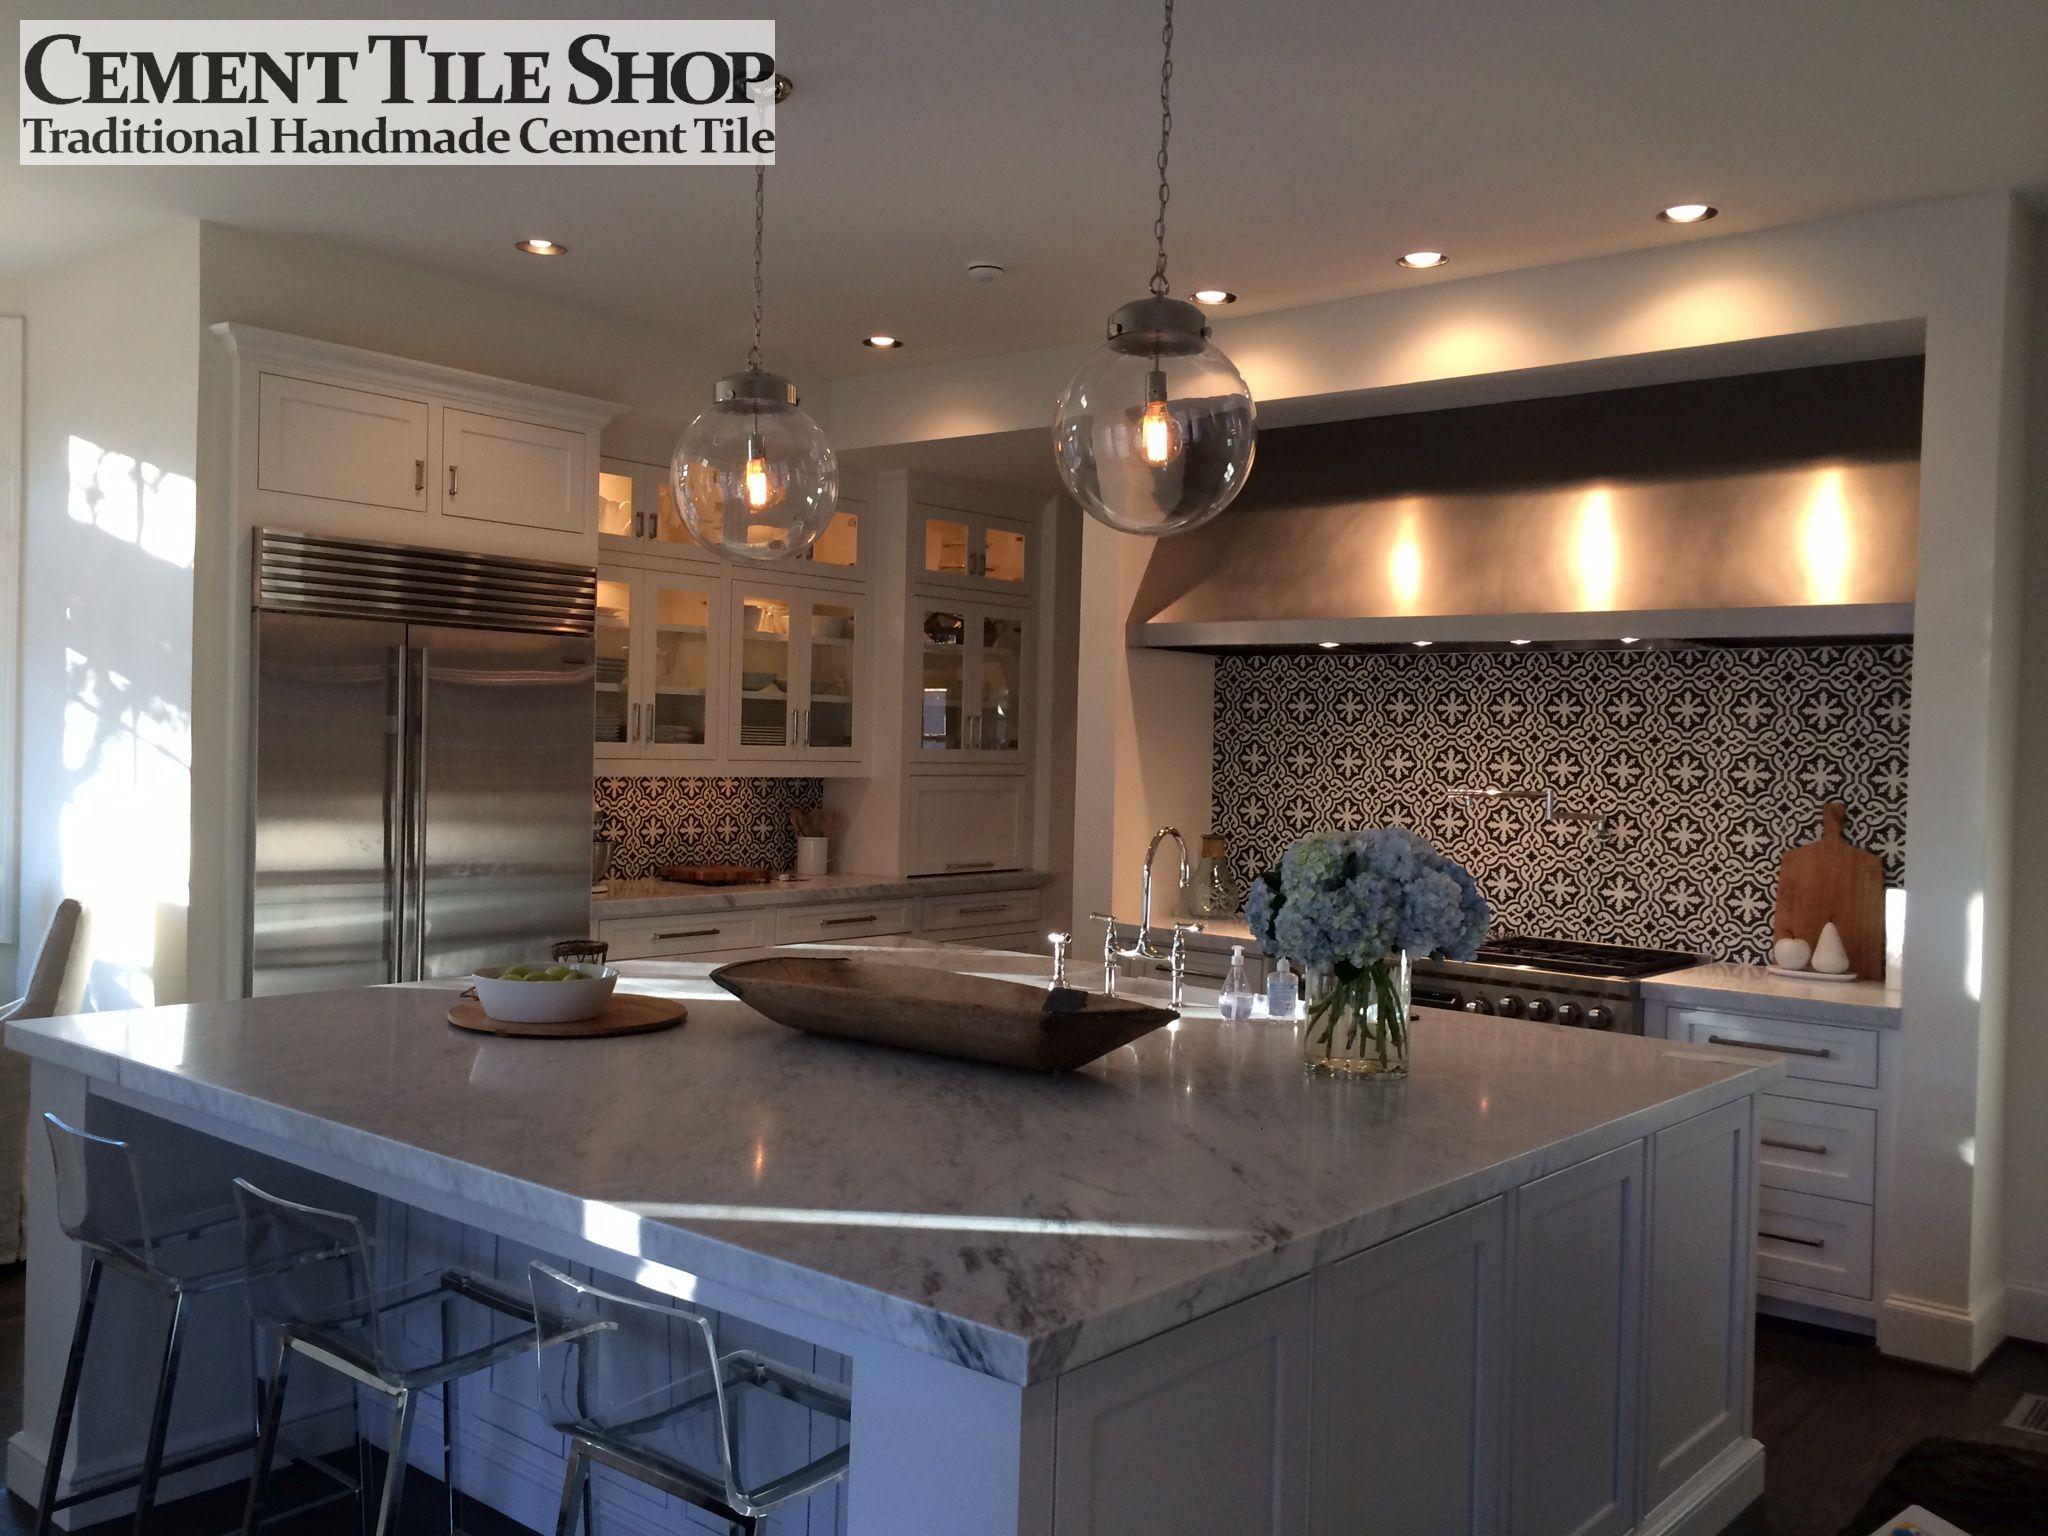 Cement-Tile-Shop-Handmade-Cement-Tile-Bordeaux-Pattern-Our-in-stock-Bordeaux-Pattern-installed-wallpaper-wp5205081